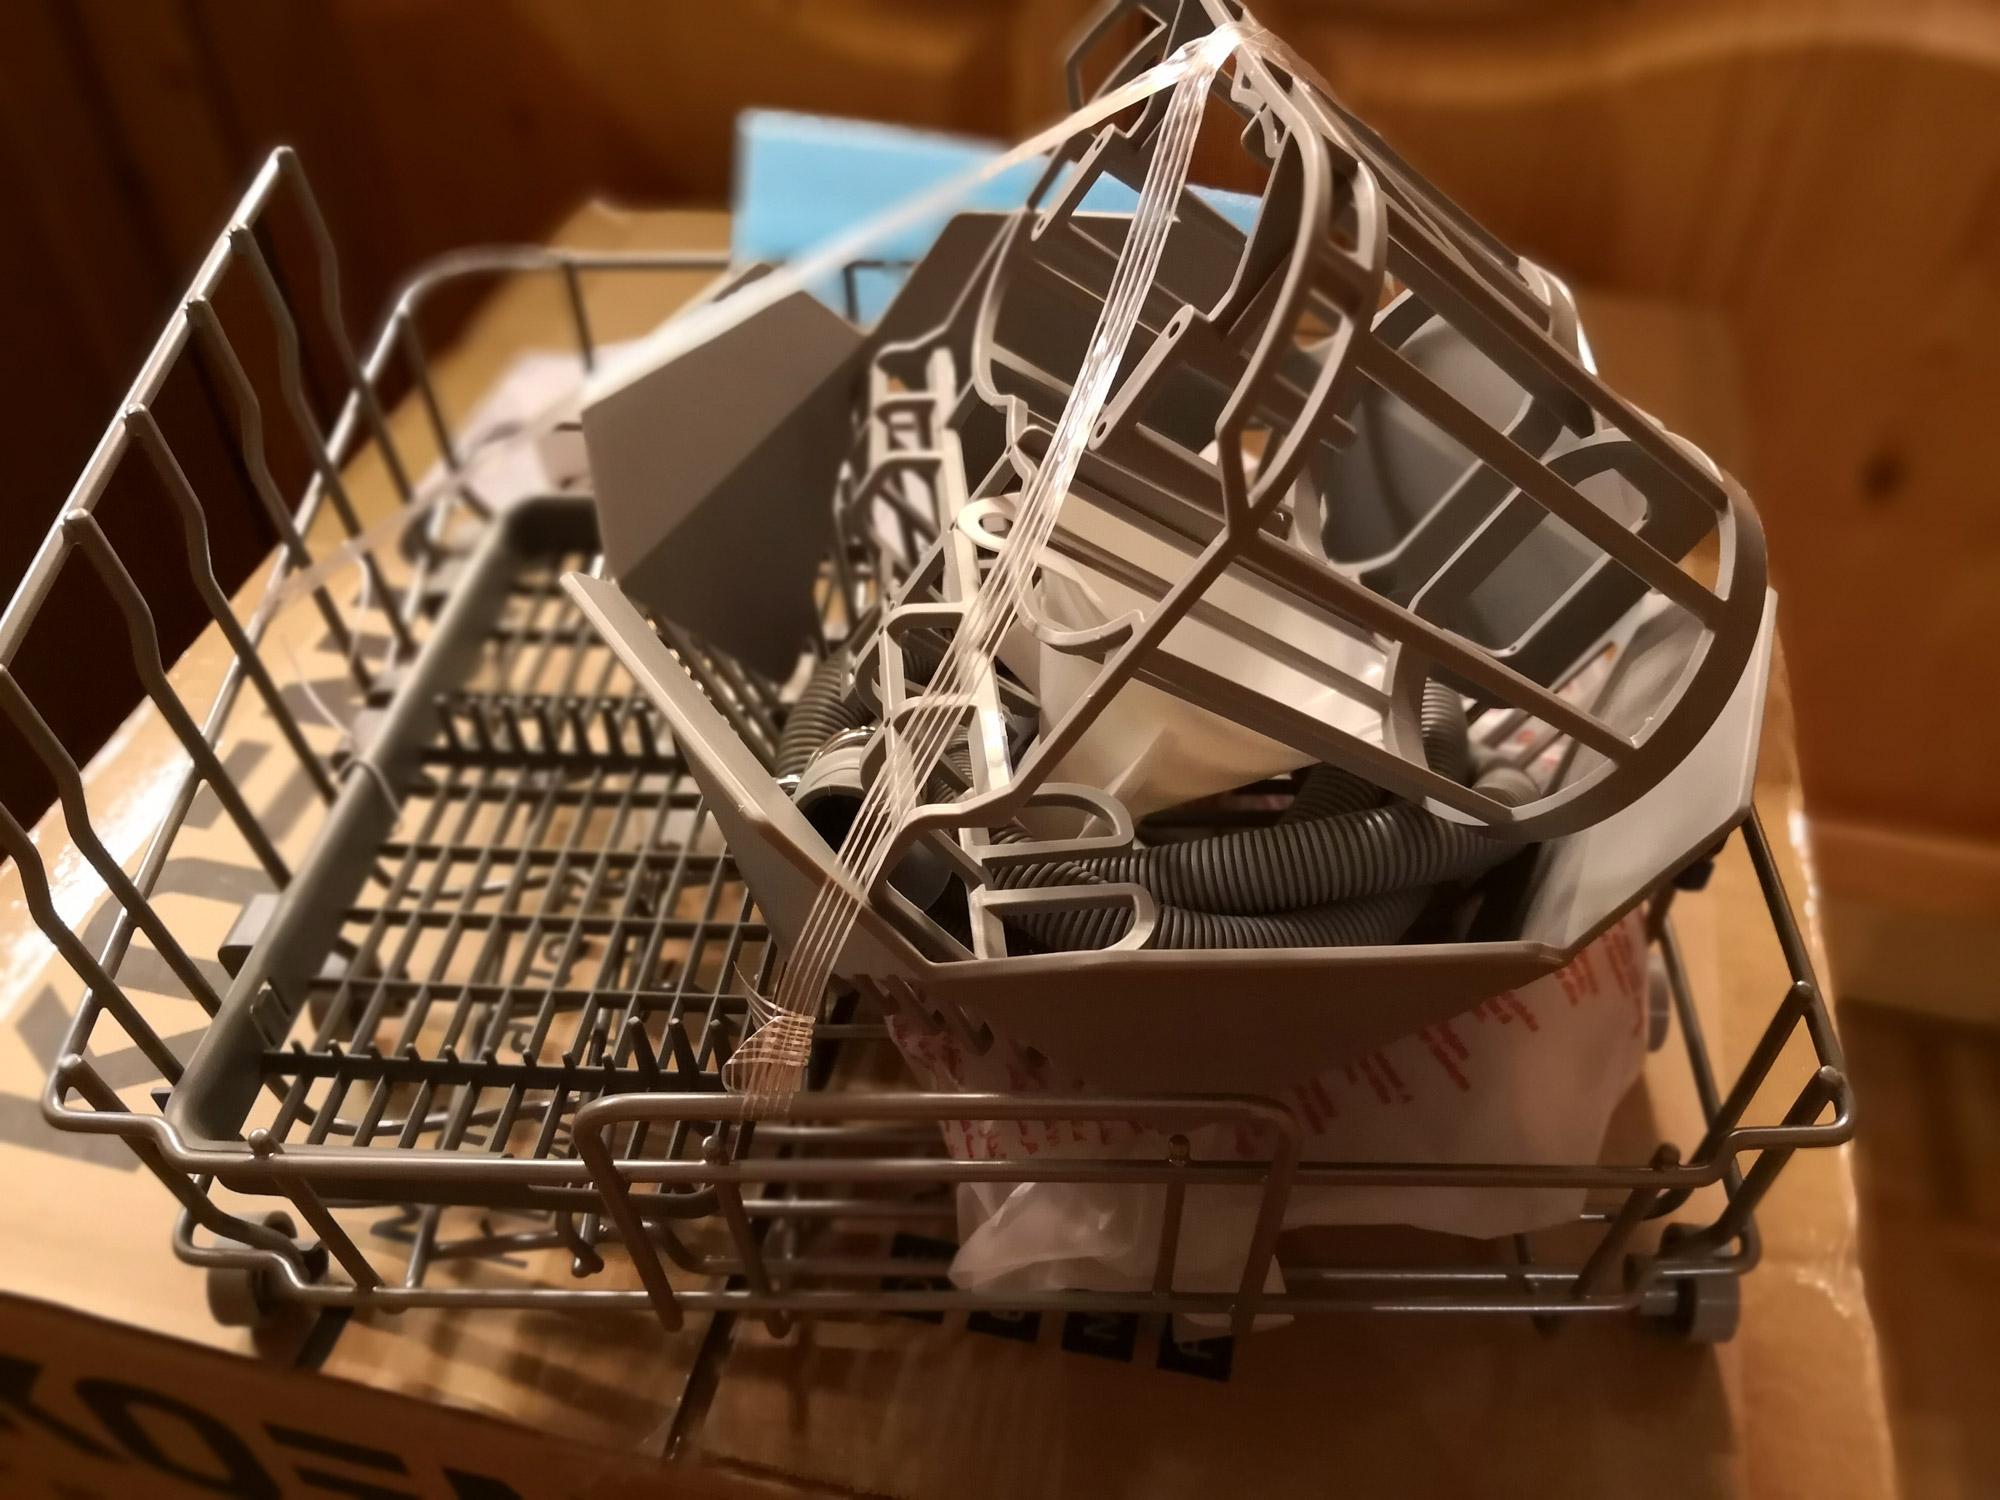 Favorit Saubere Sache: Der Koenic KDW 1112 Tisch-Geschirrspüler im Test AO13